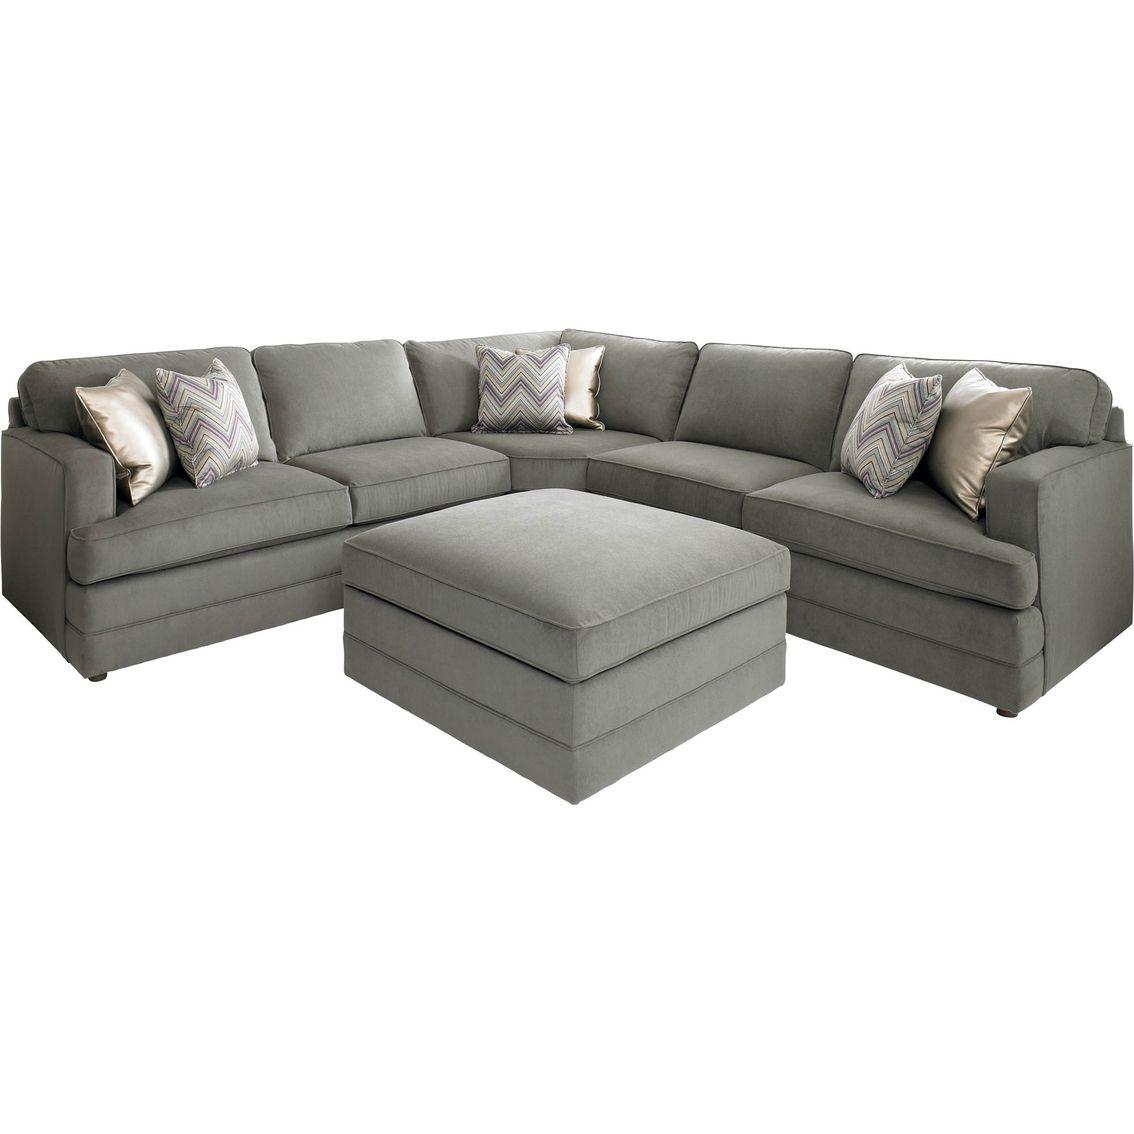 L Shape Sectional Sofa Sectional Sofa Design Best Er L